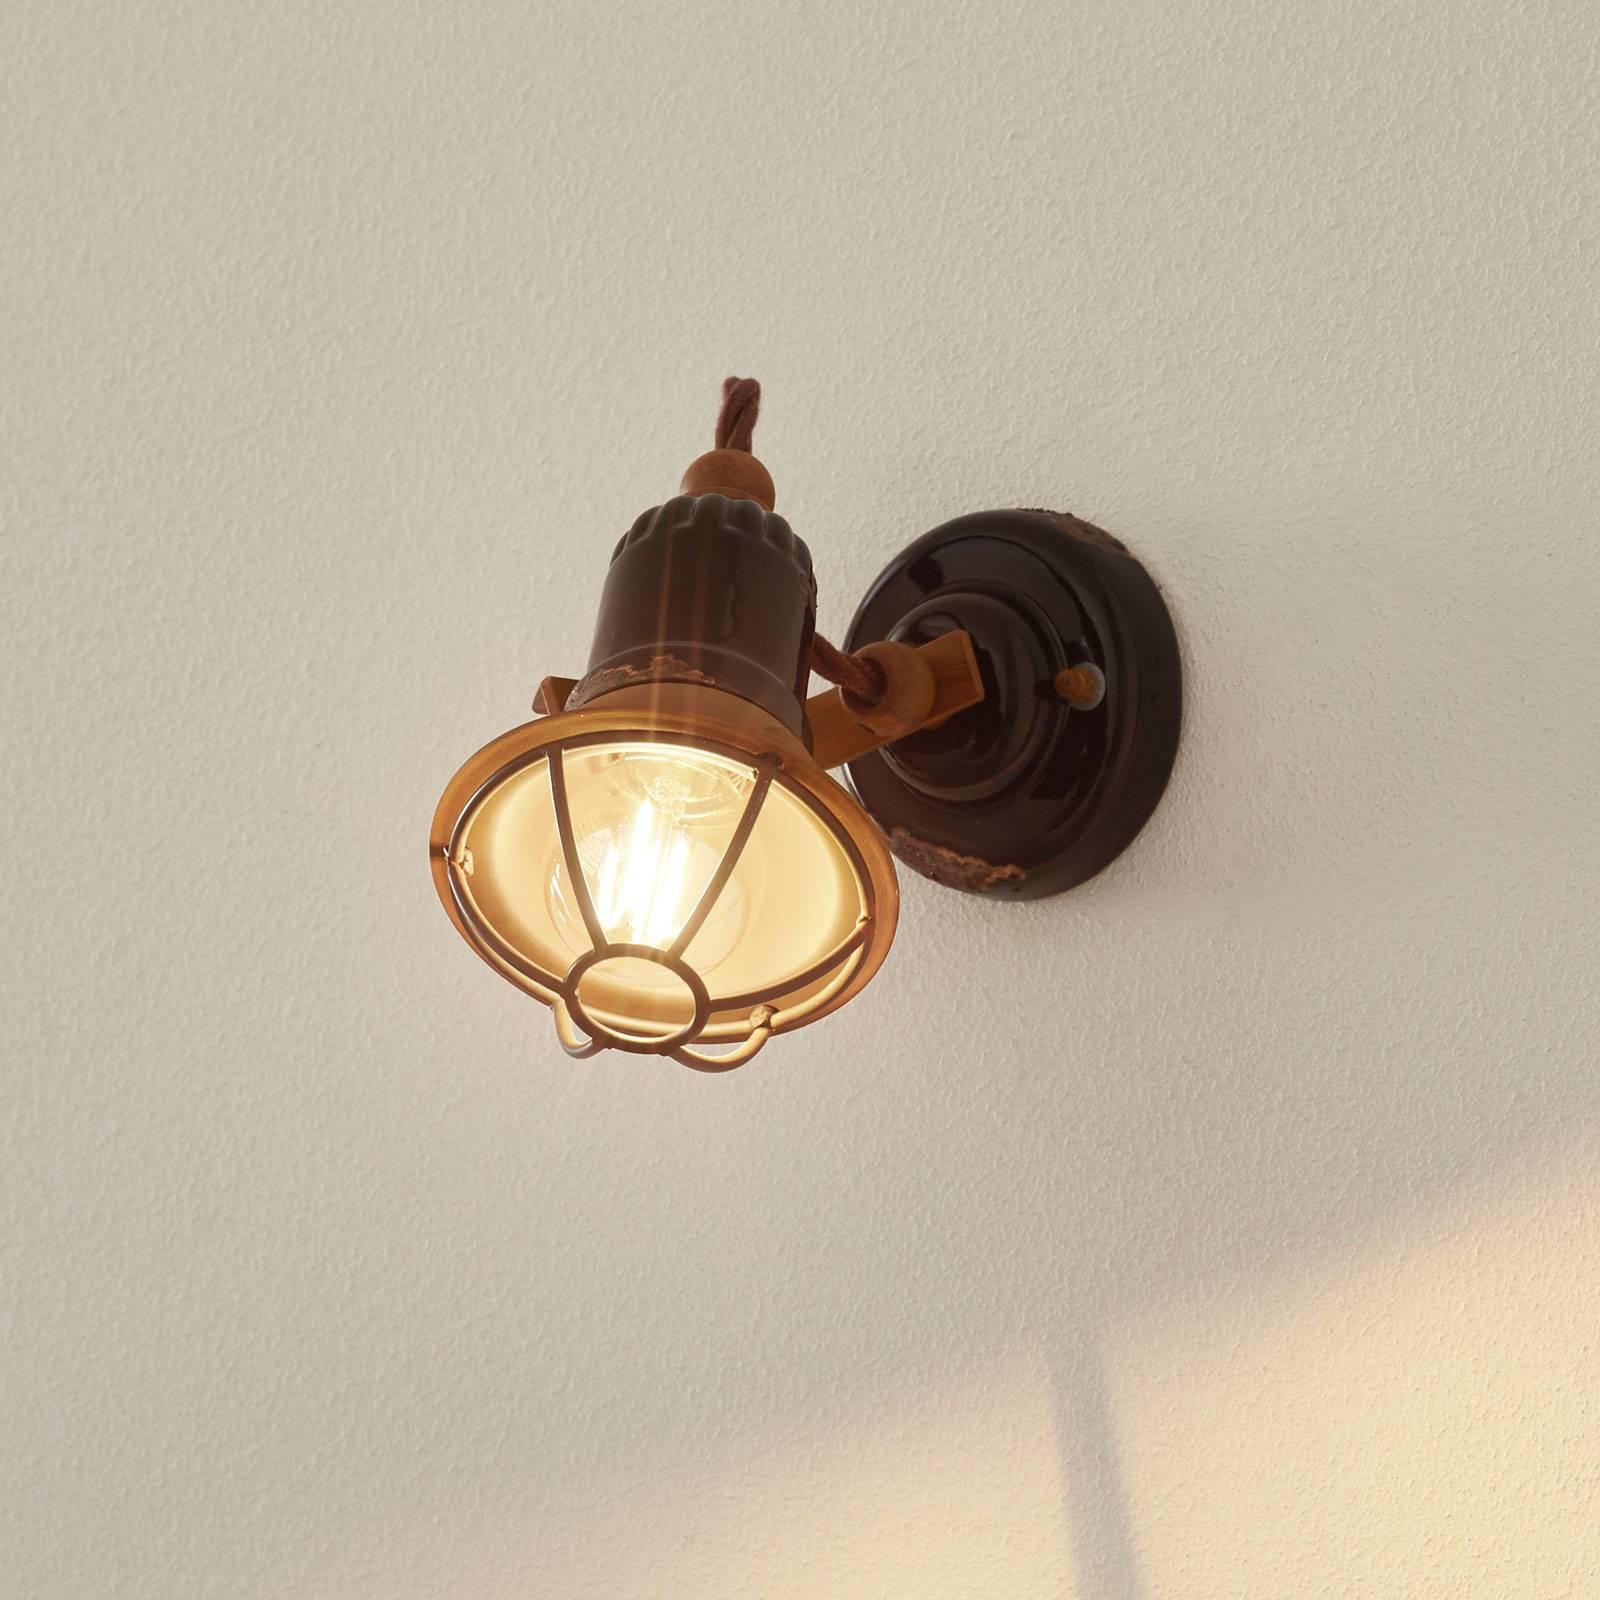 C1675/1-seinälamppu, kori, 1-lamp., musta